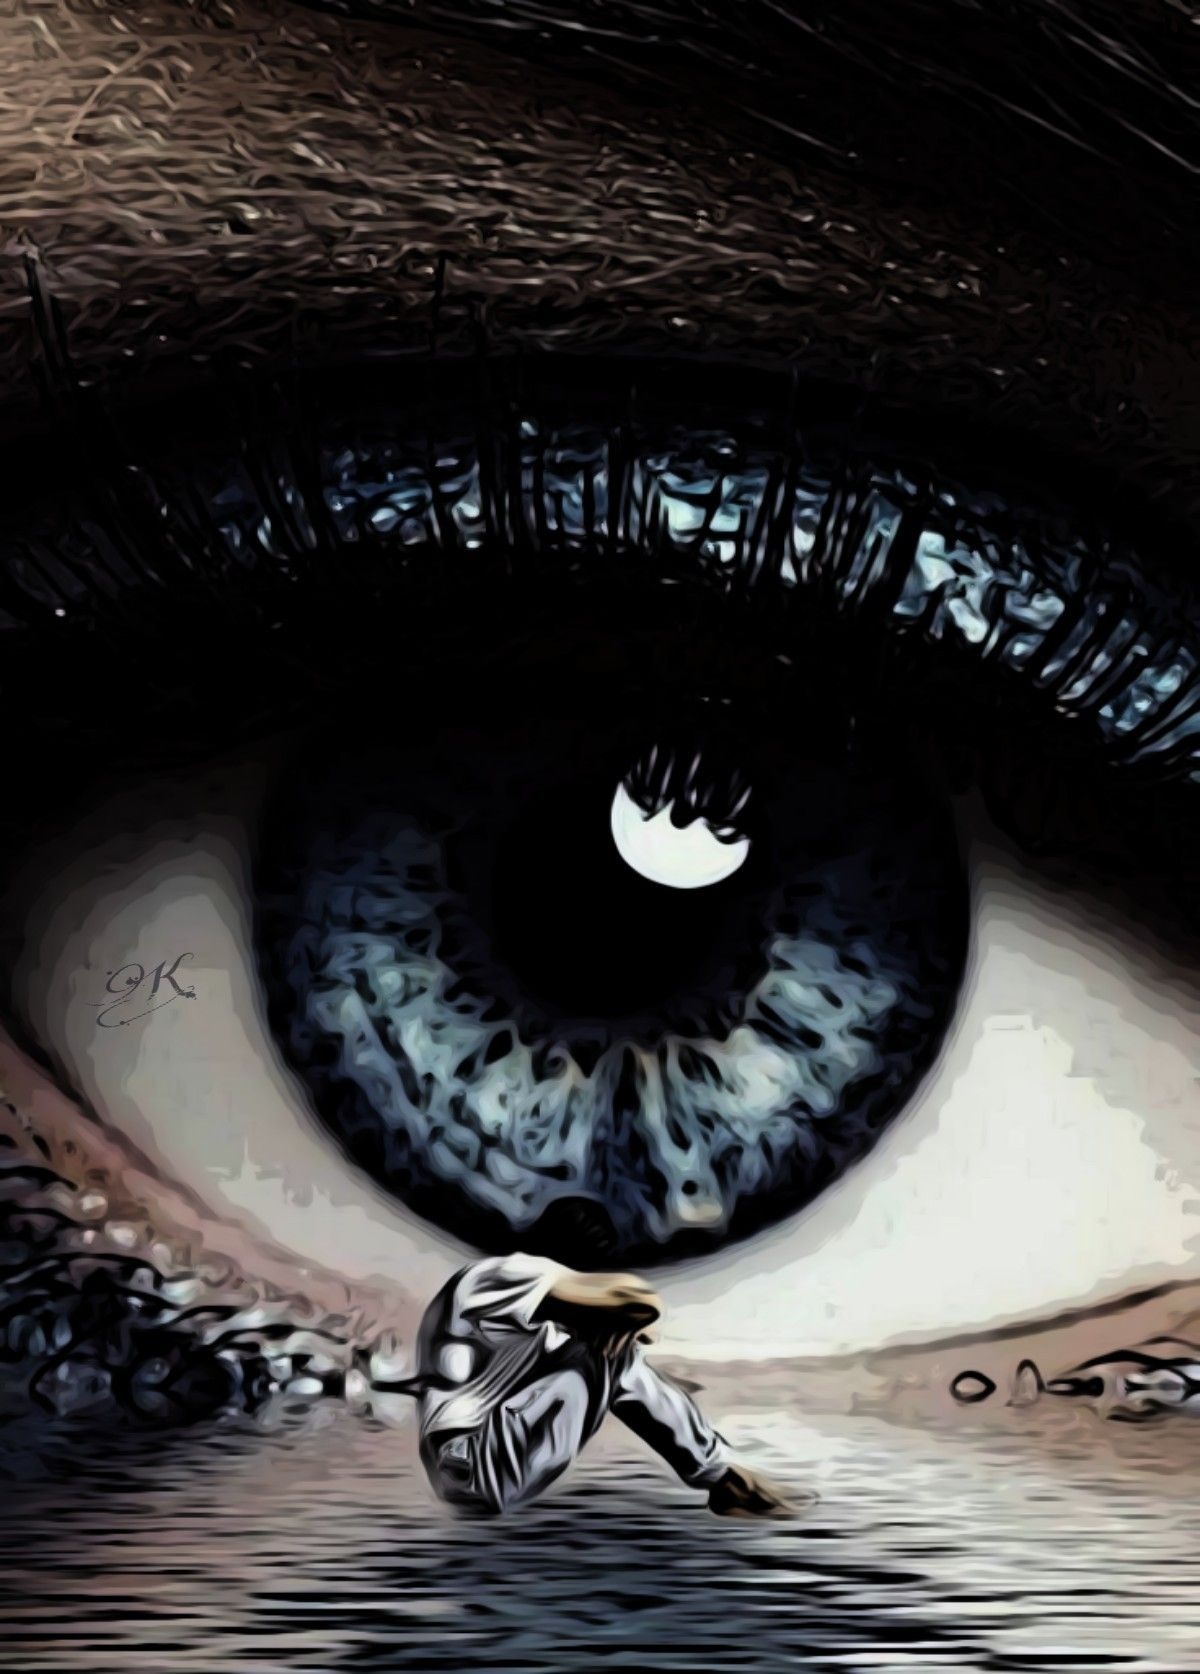 Pin by Inesa on MIRADAS HERMOSAS (Kay) Trippy eye, Cool